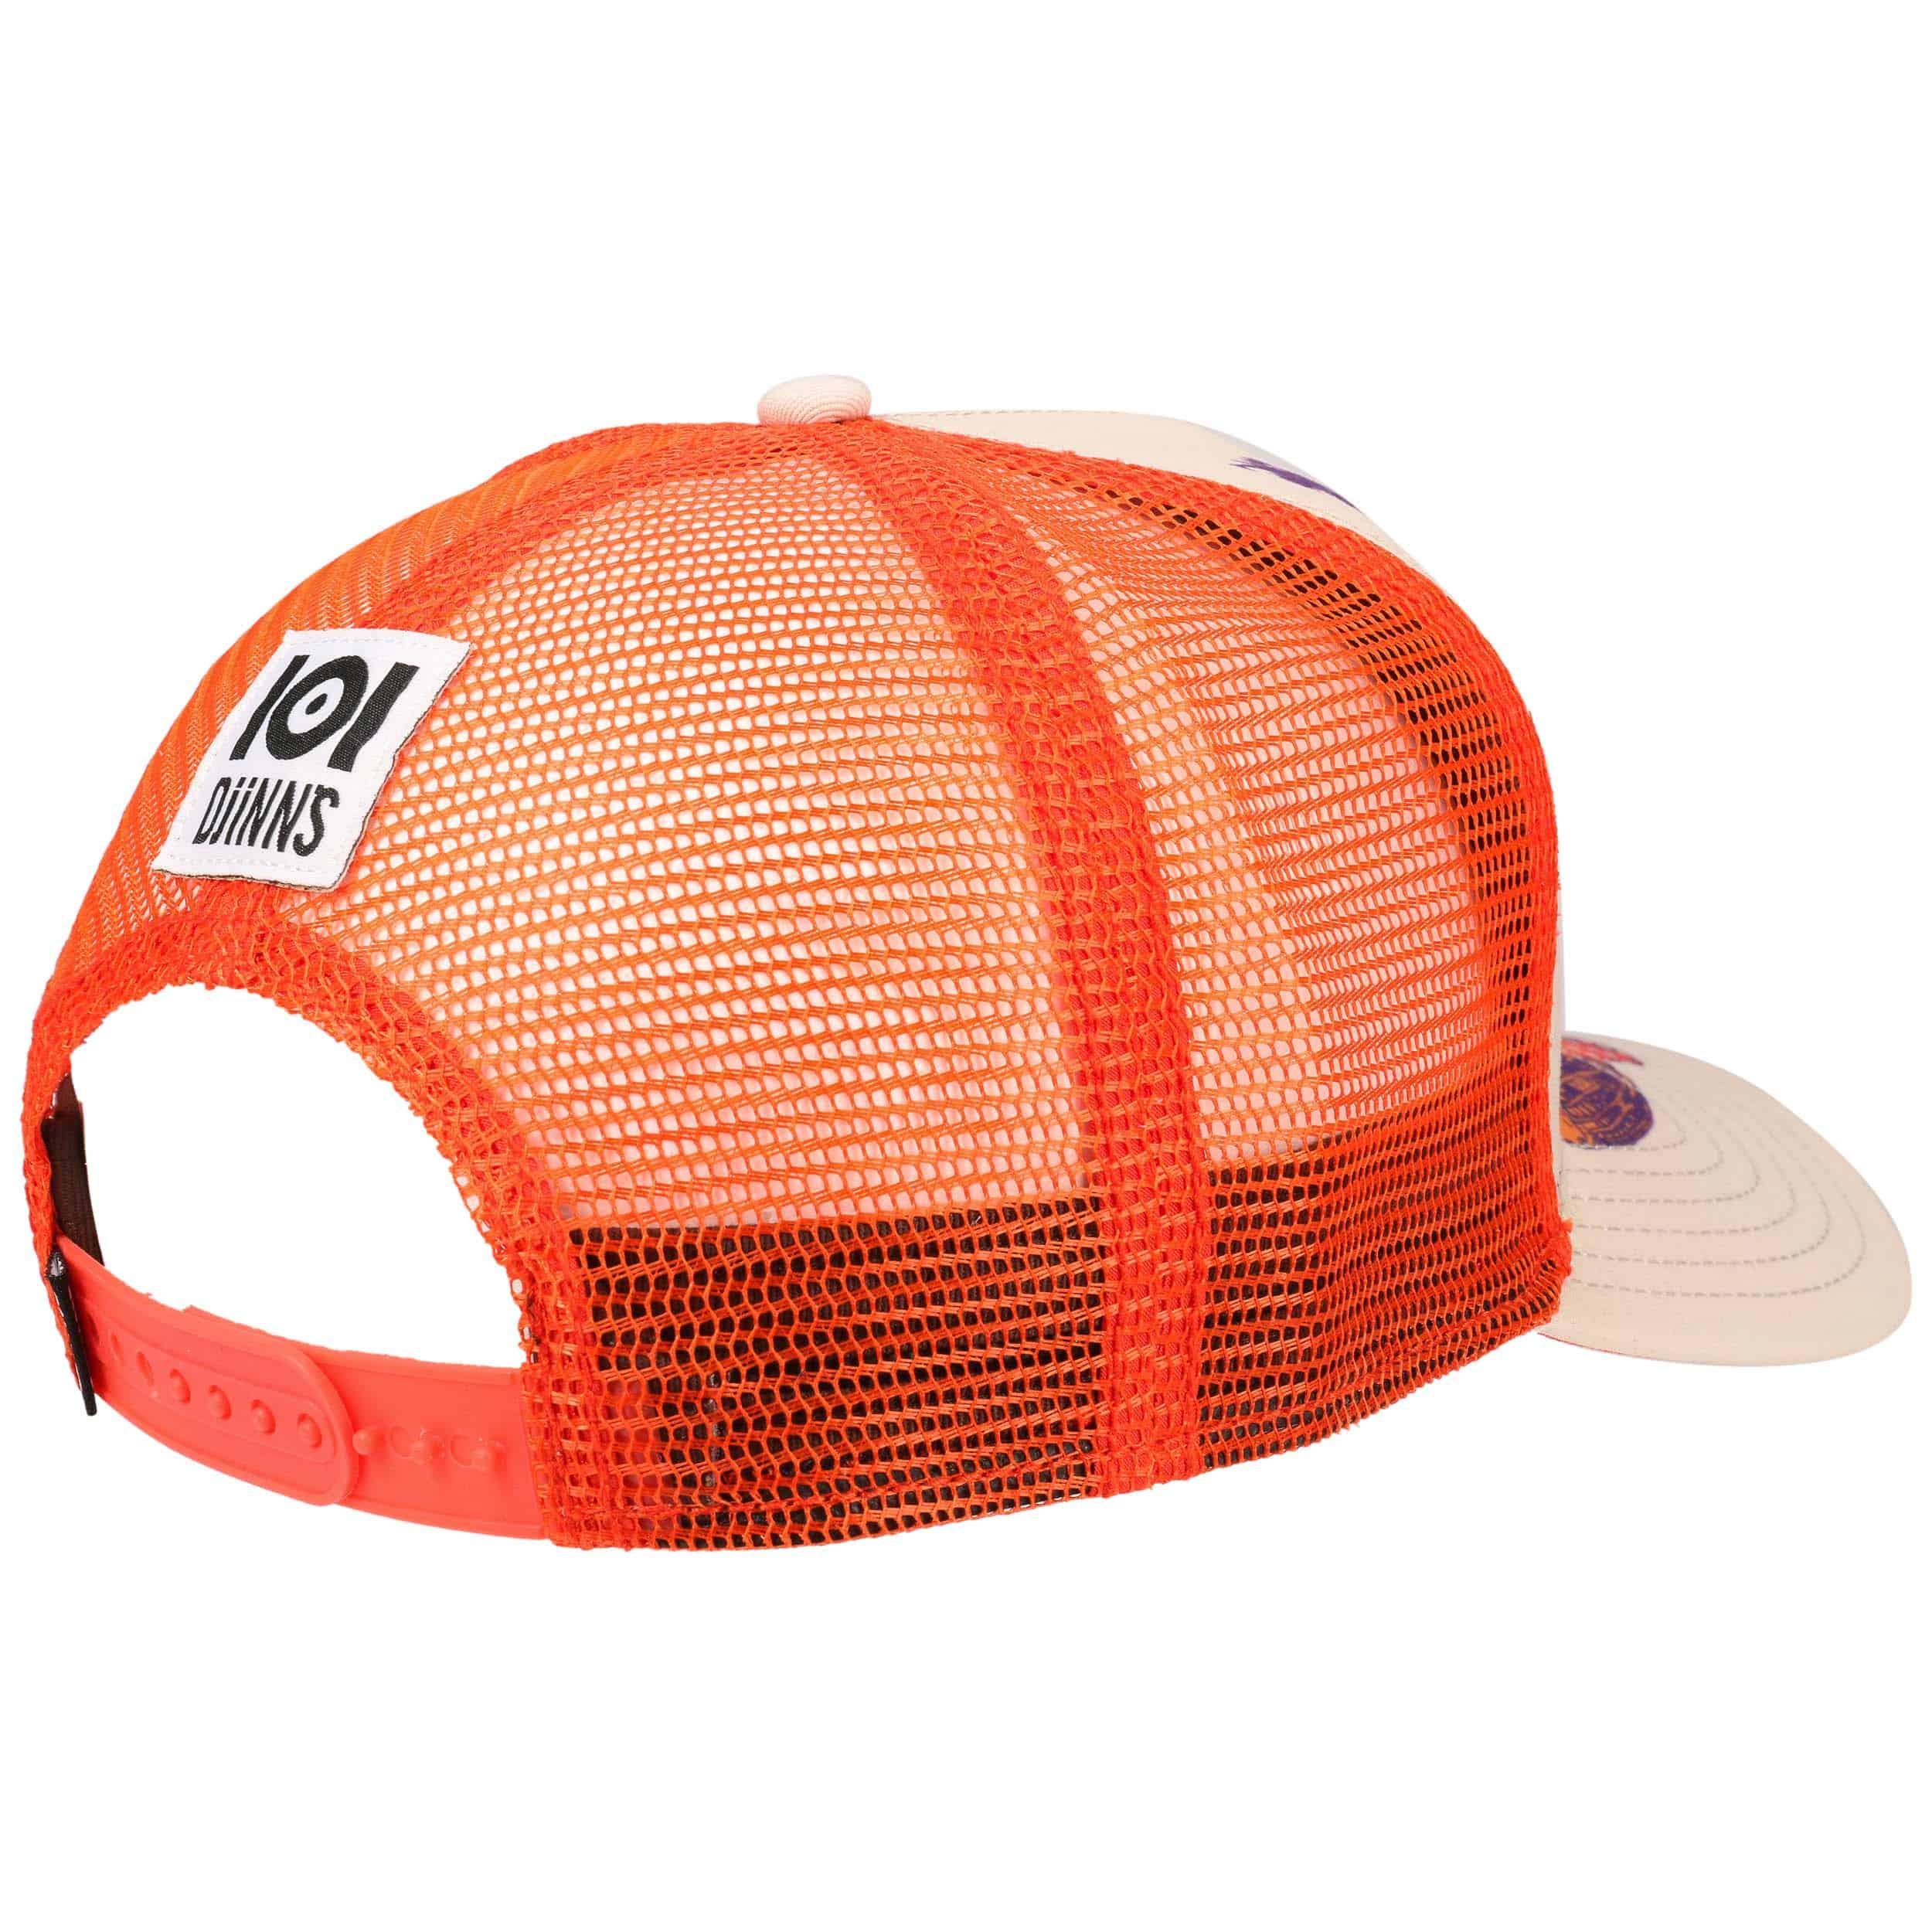 rio hft 101 trucker cap by djinns eur 24 95 hats. Black Bedroom Furniture Sets. Home Design Ideas